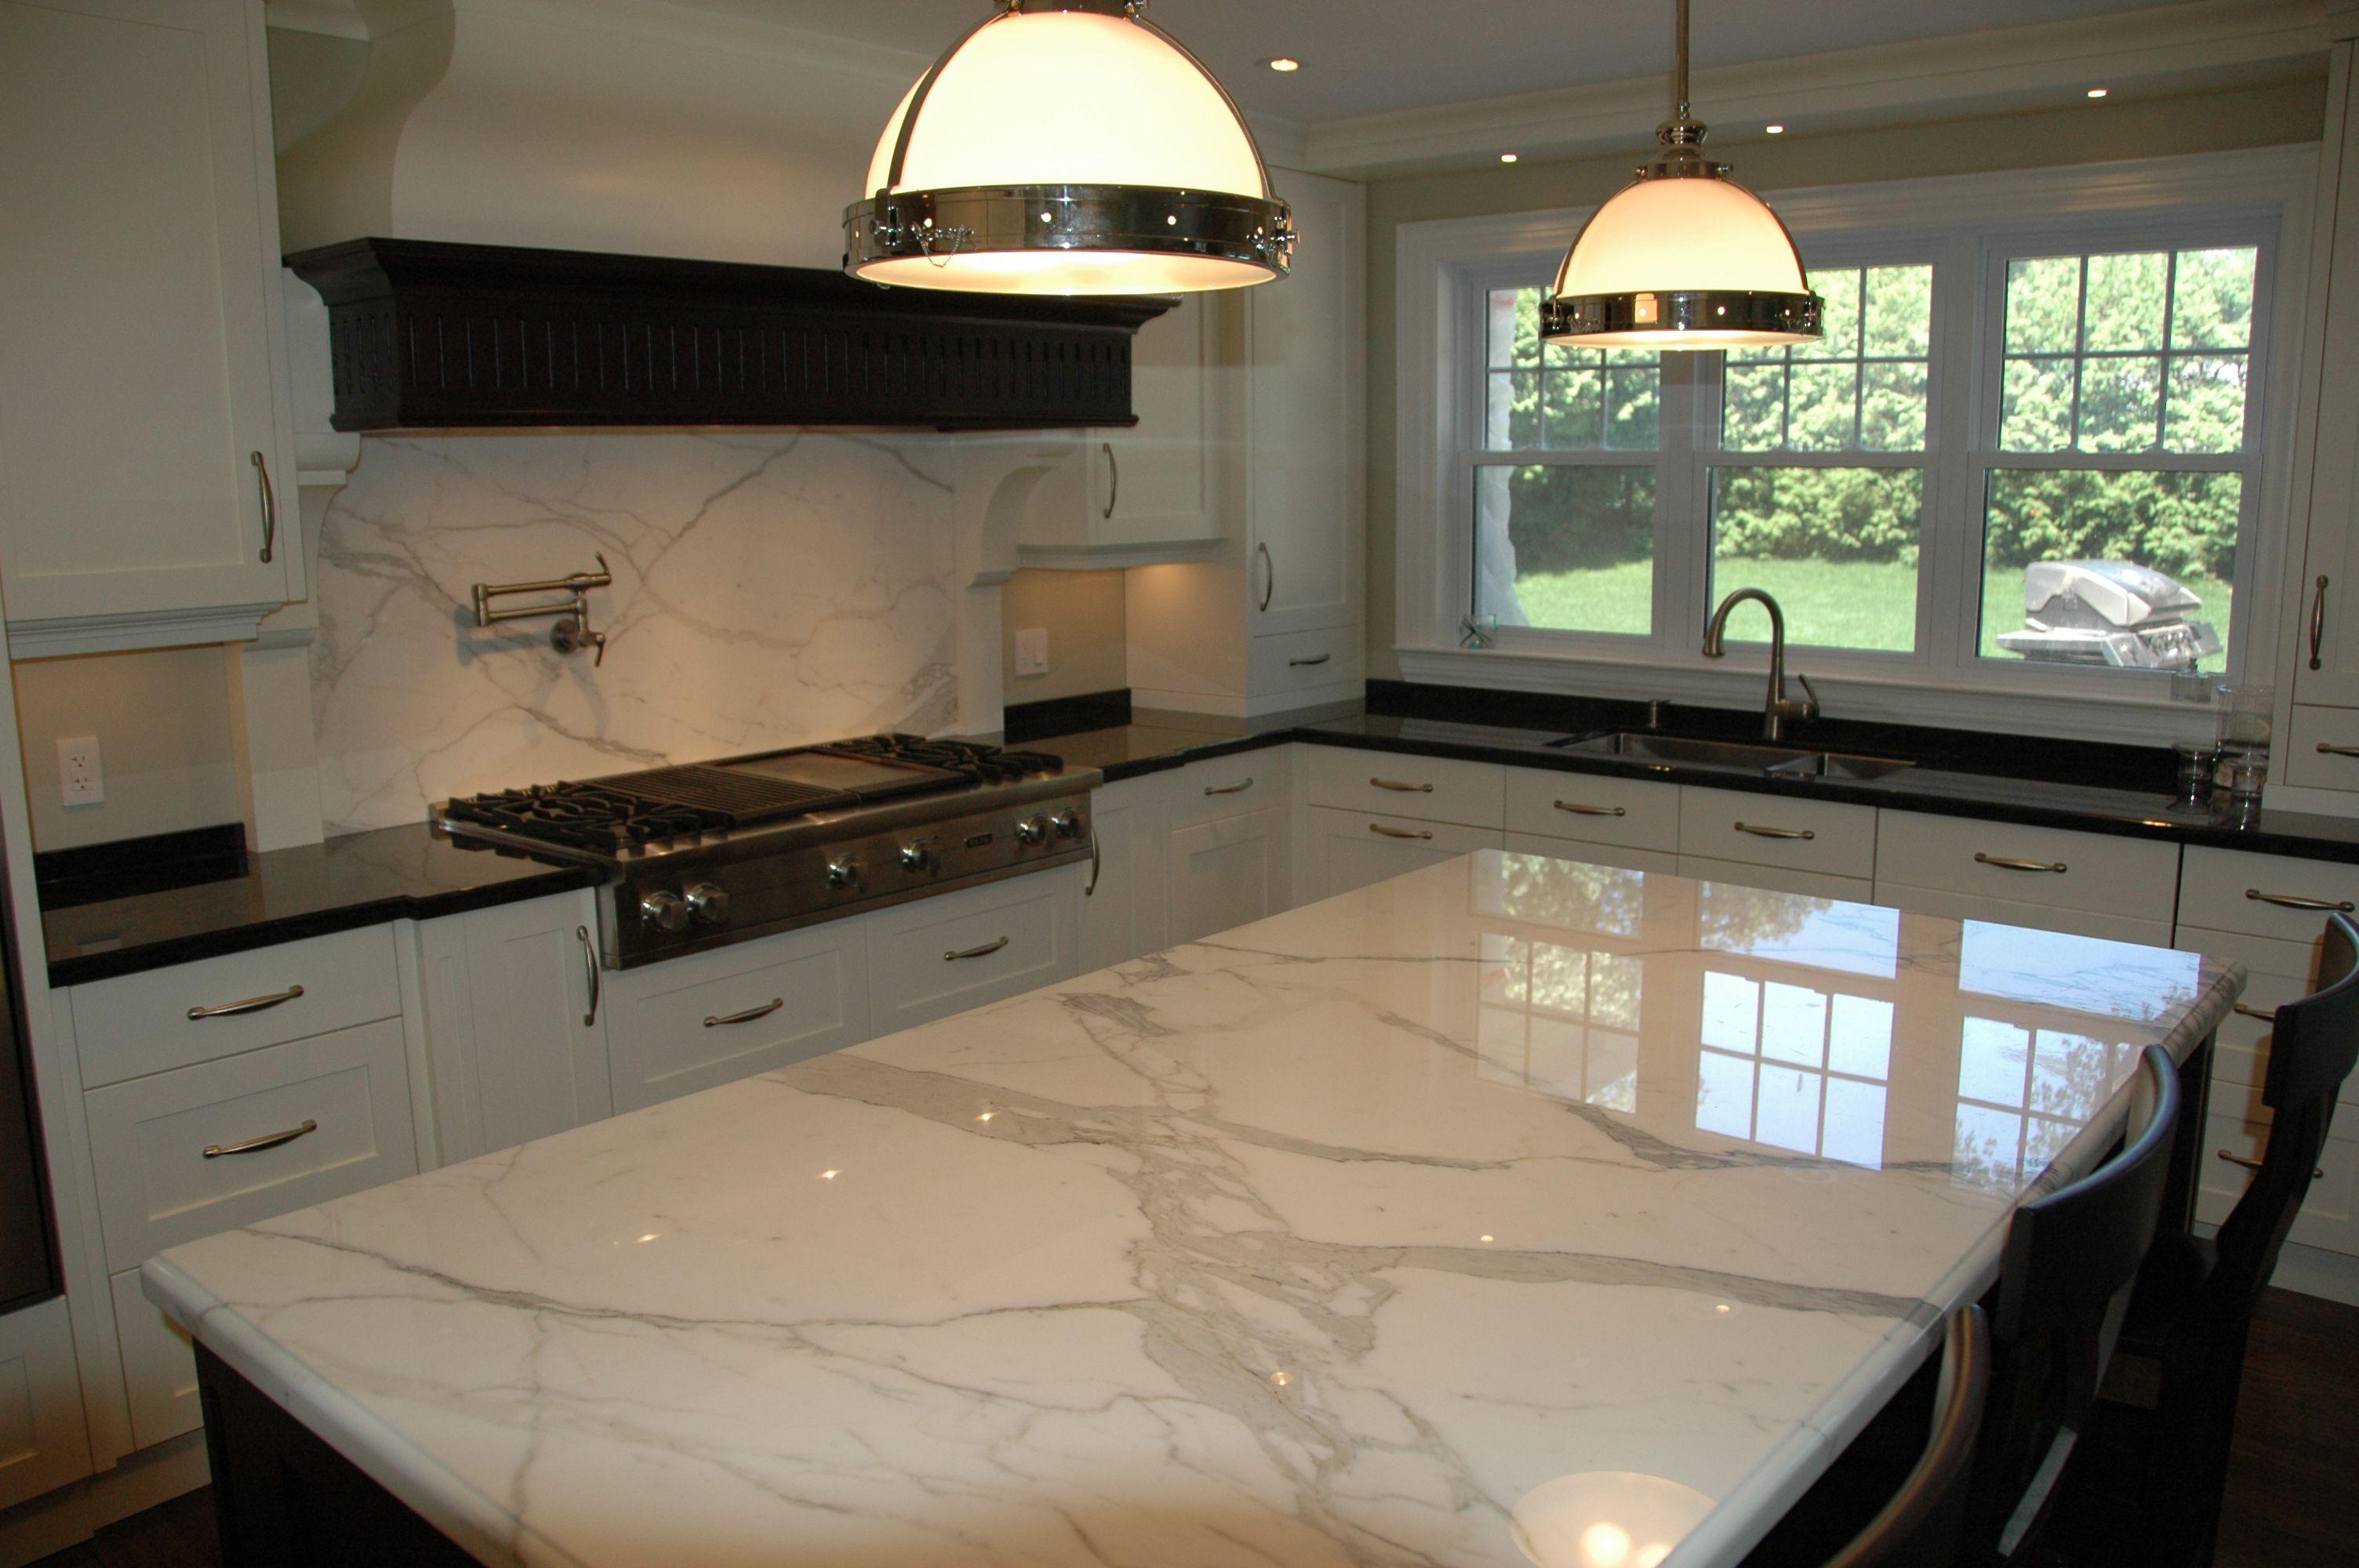 Marble Island Backsplash Quartz Counter Countertops